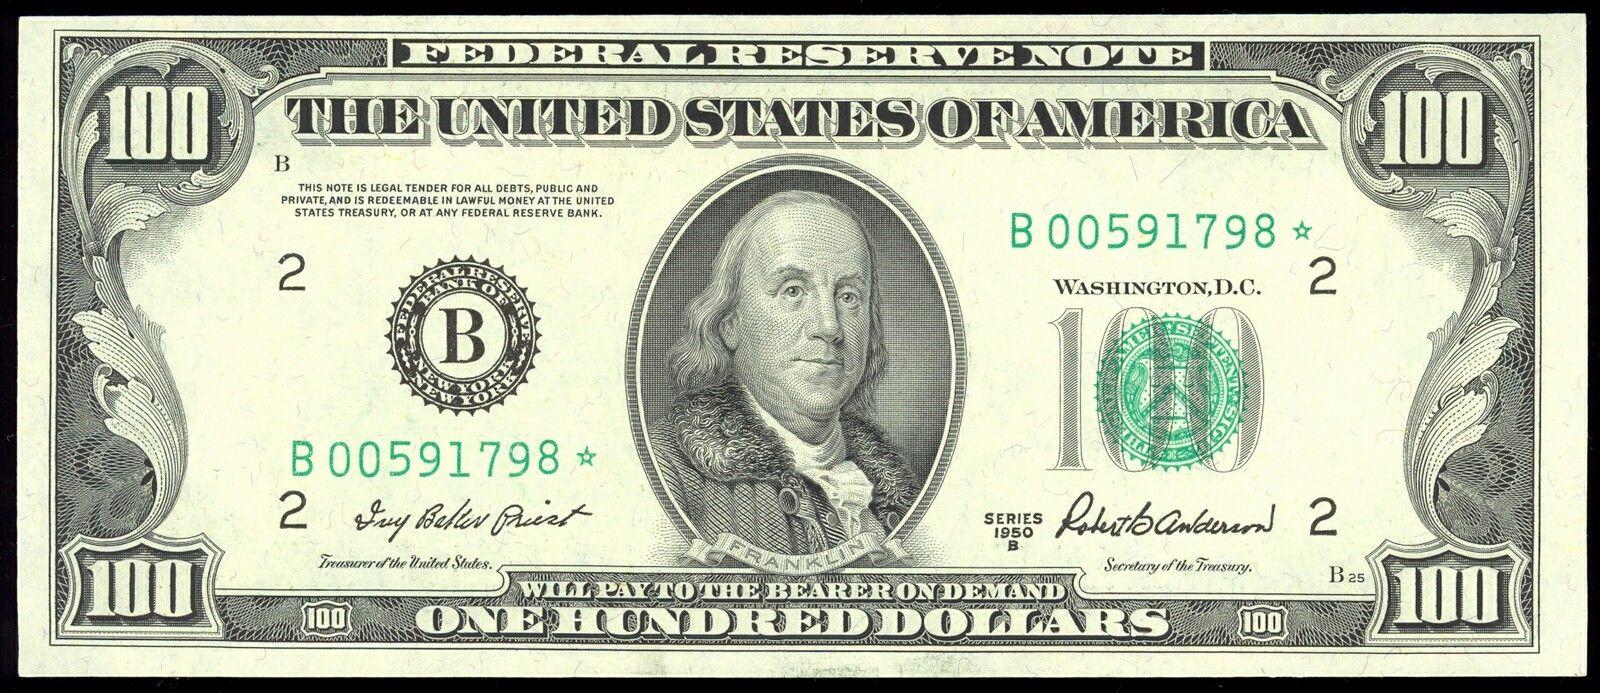 VIRGINIA USA US 1 $ DOLLAR  FRN 2013  UNC E 5 RICHMOND